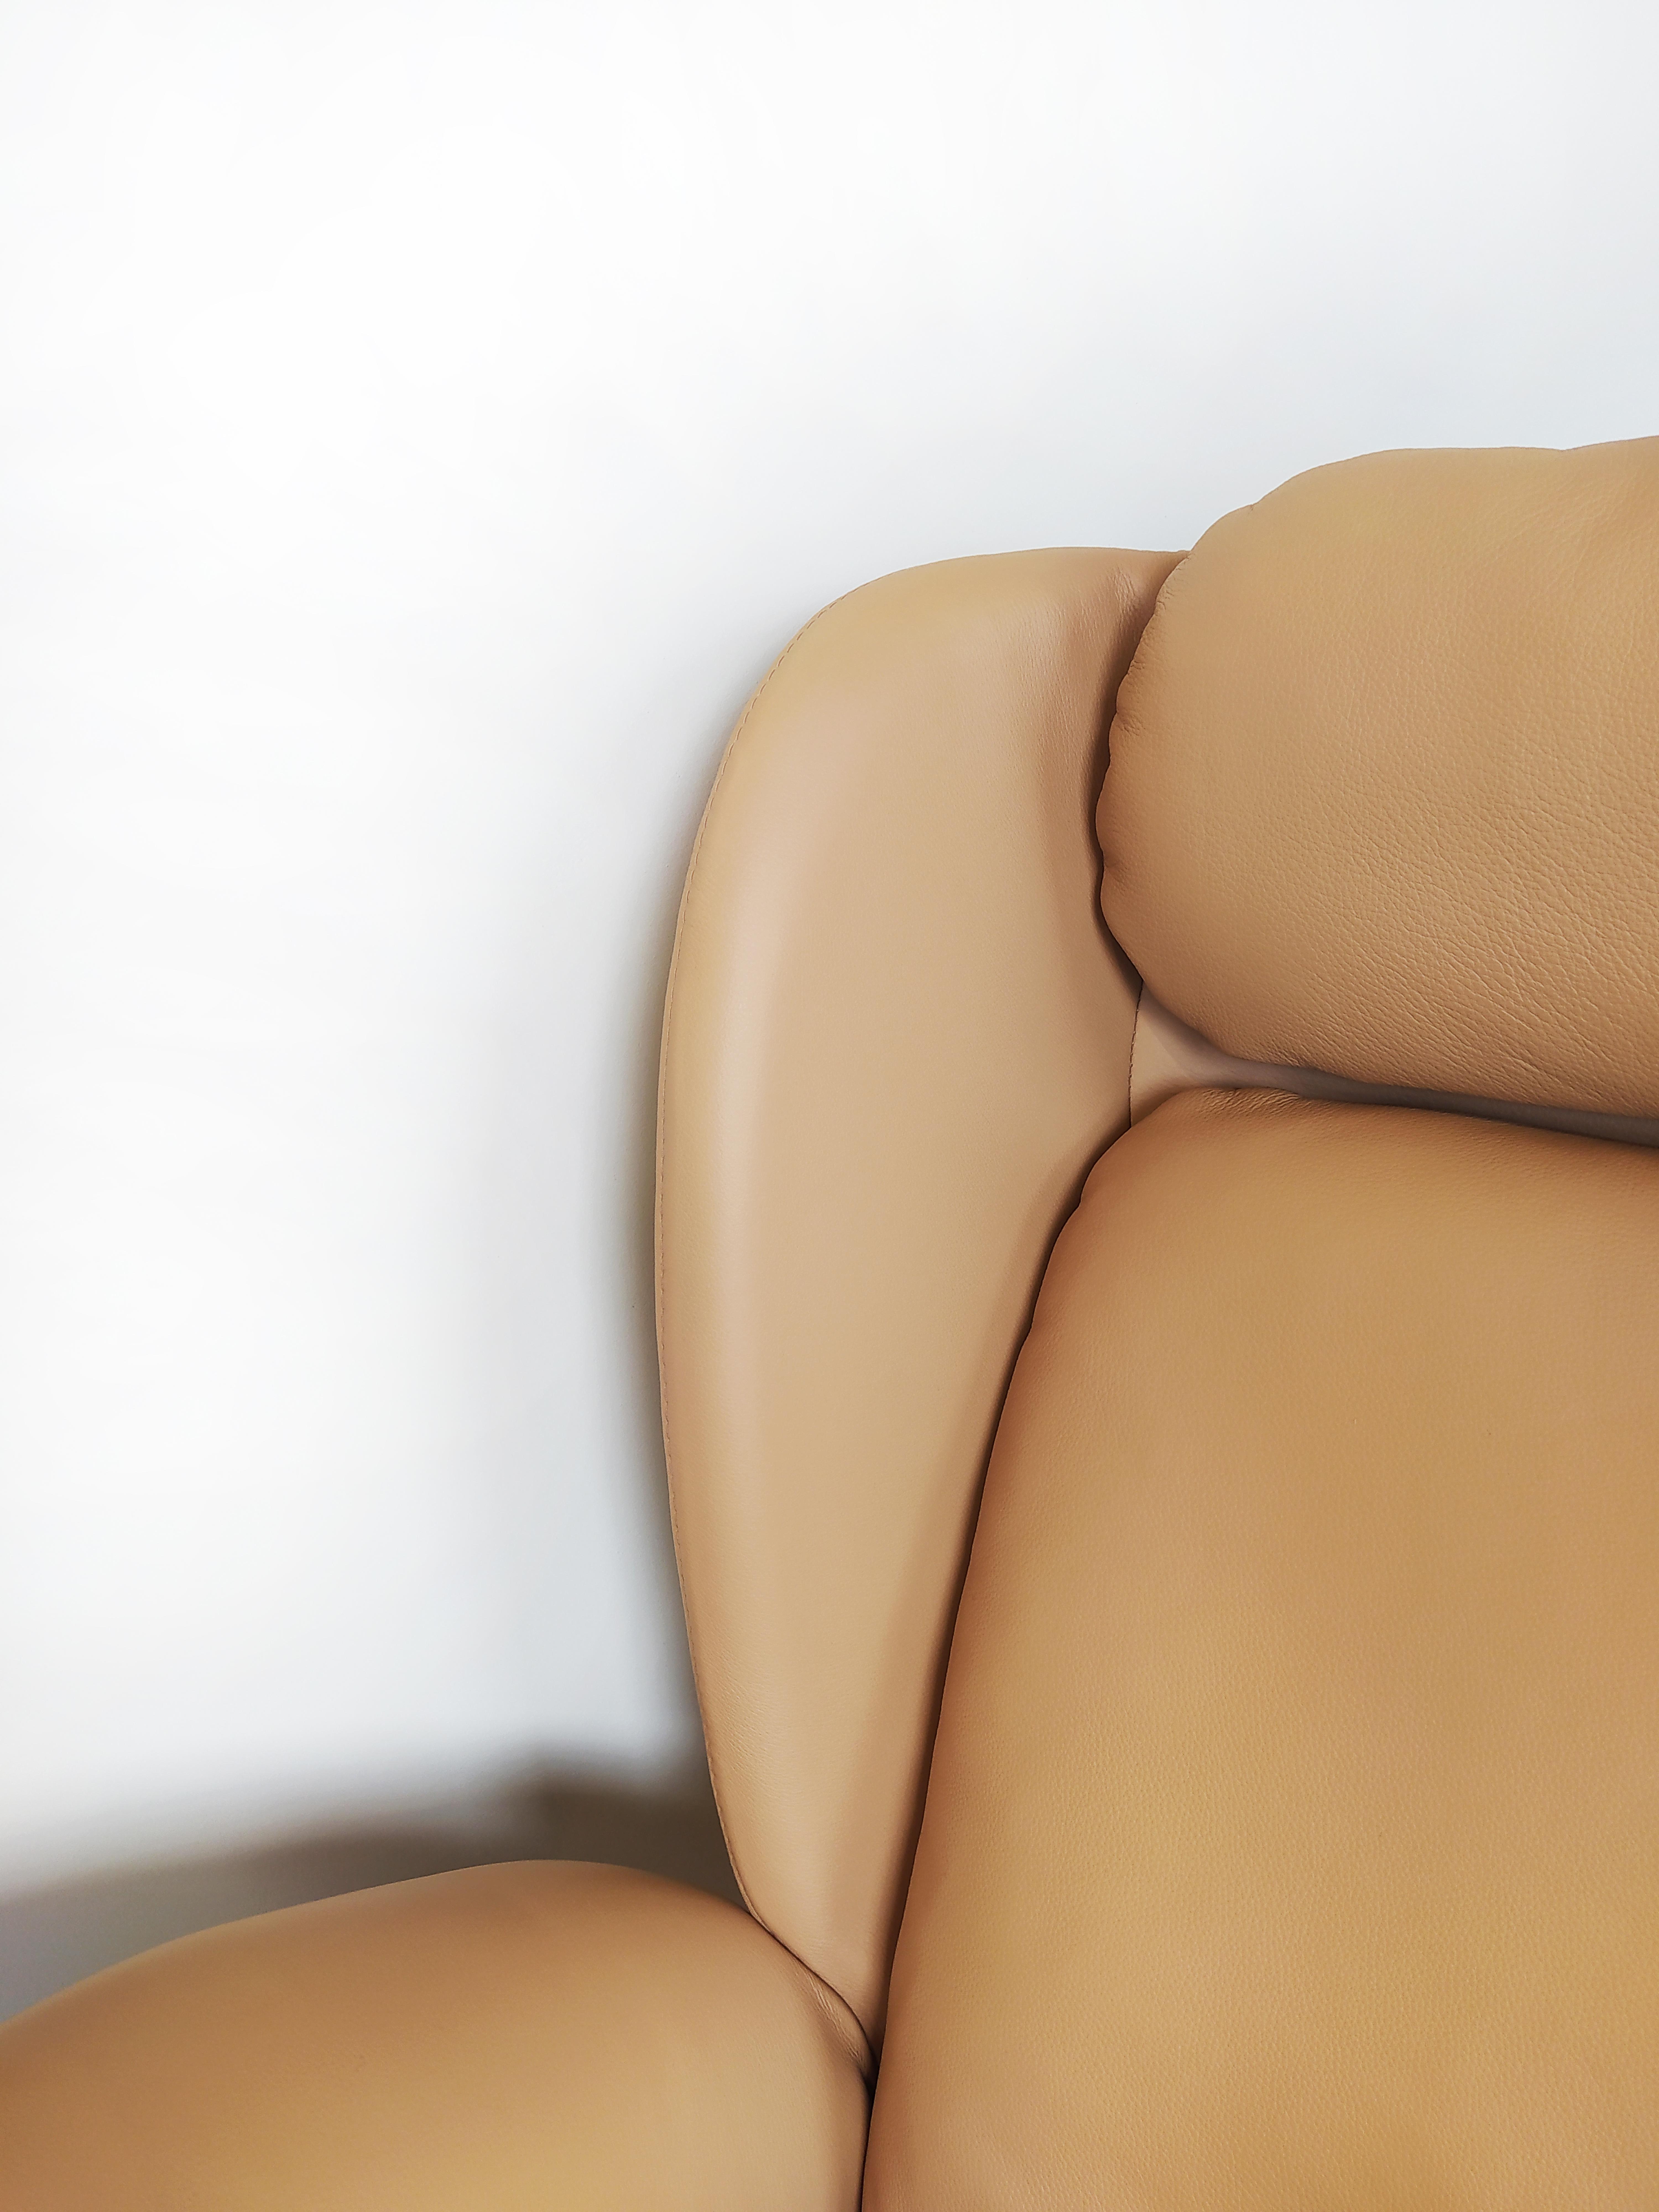 Jane fauteuil leder Evolution Design meubelen solden